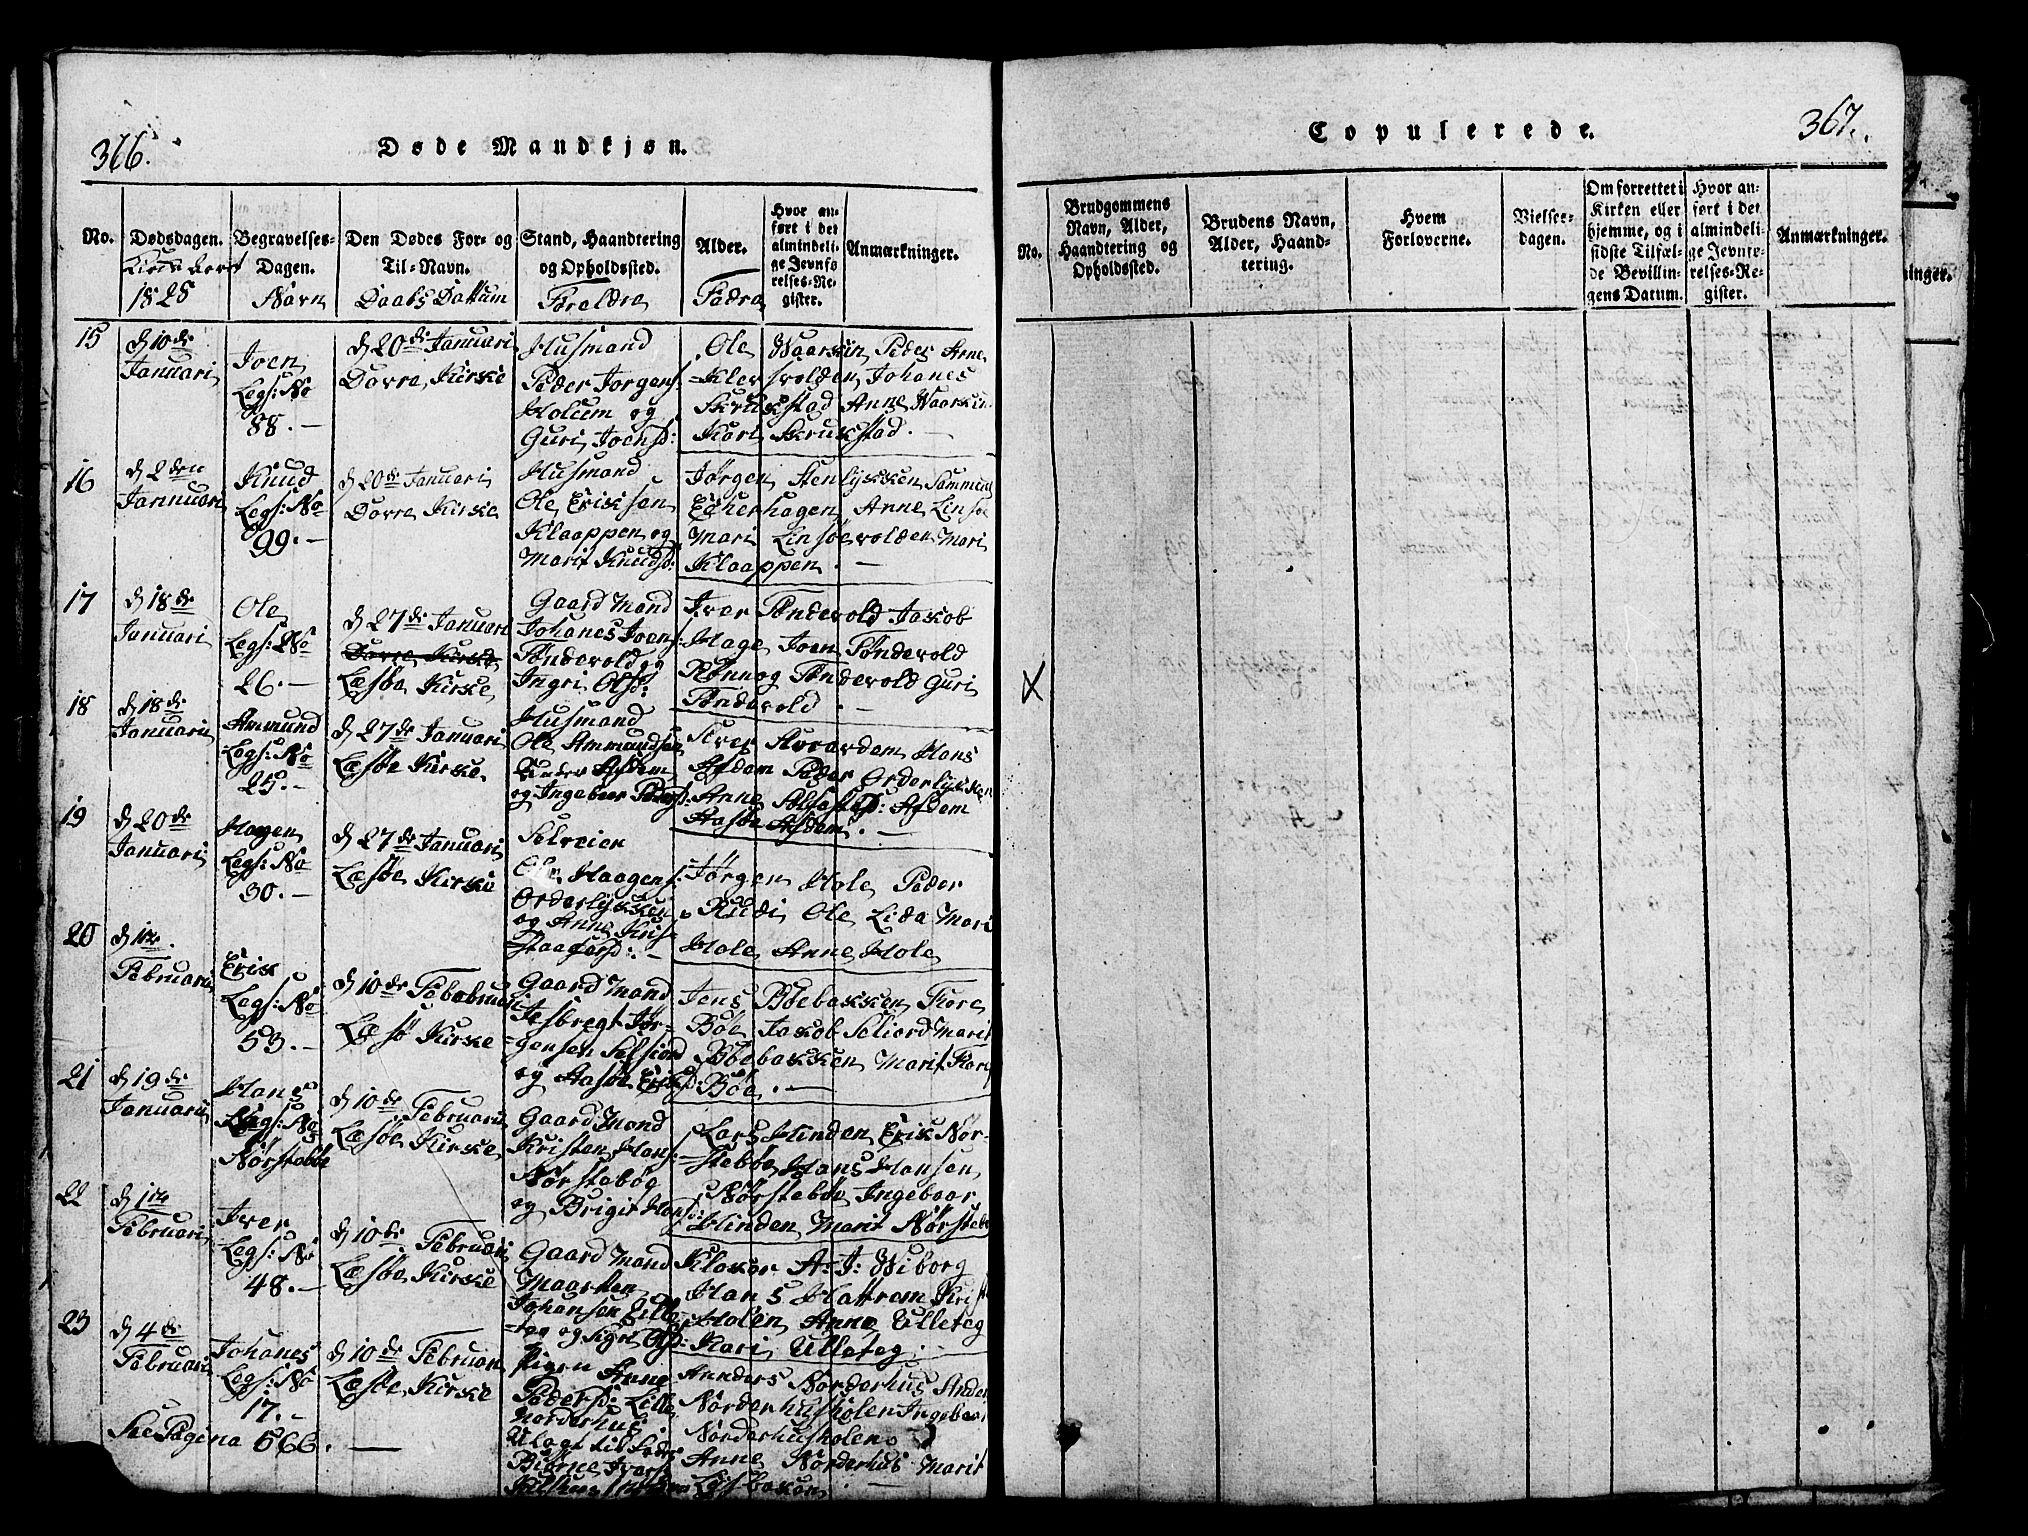 SAH, Lesja prestekontor, Klokkerbok nr. 1, 1820-1831, s. 366-367